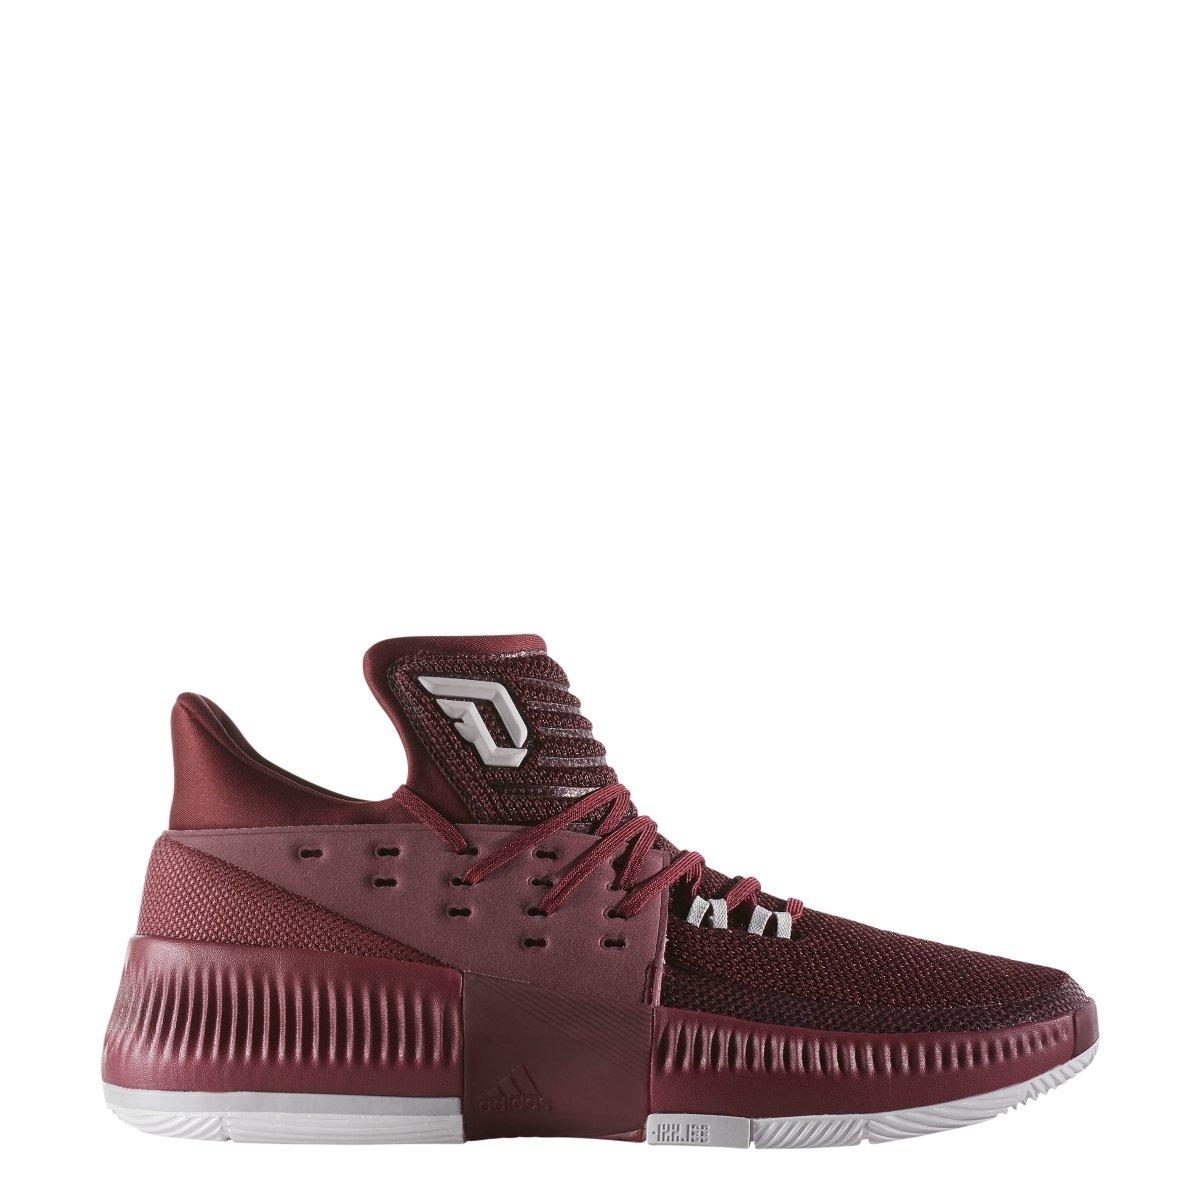 Adidas hombre 's d baloncesto Lillard 3 zapatilla de baloncesto d b0753y18wq 10 D (m) 09c182